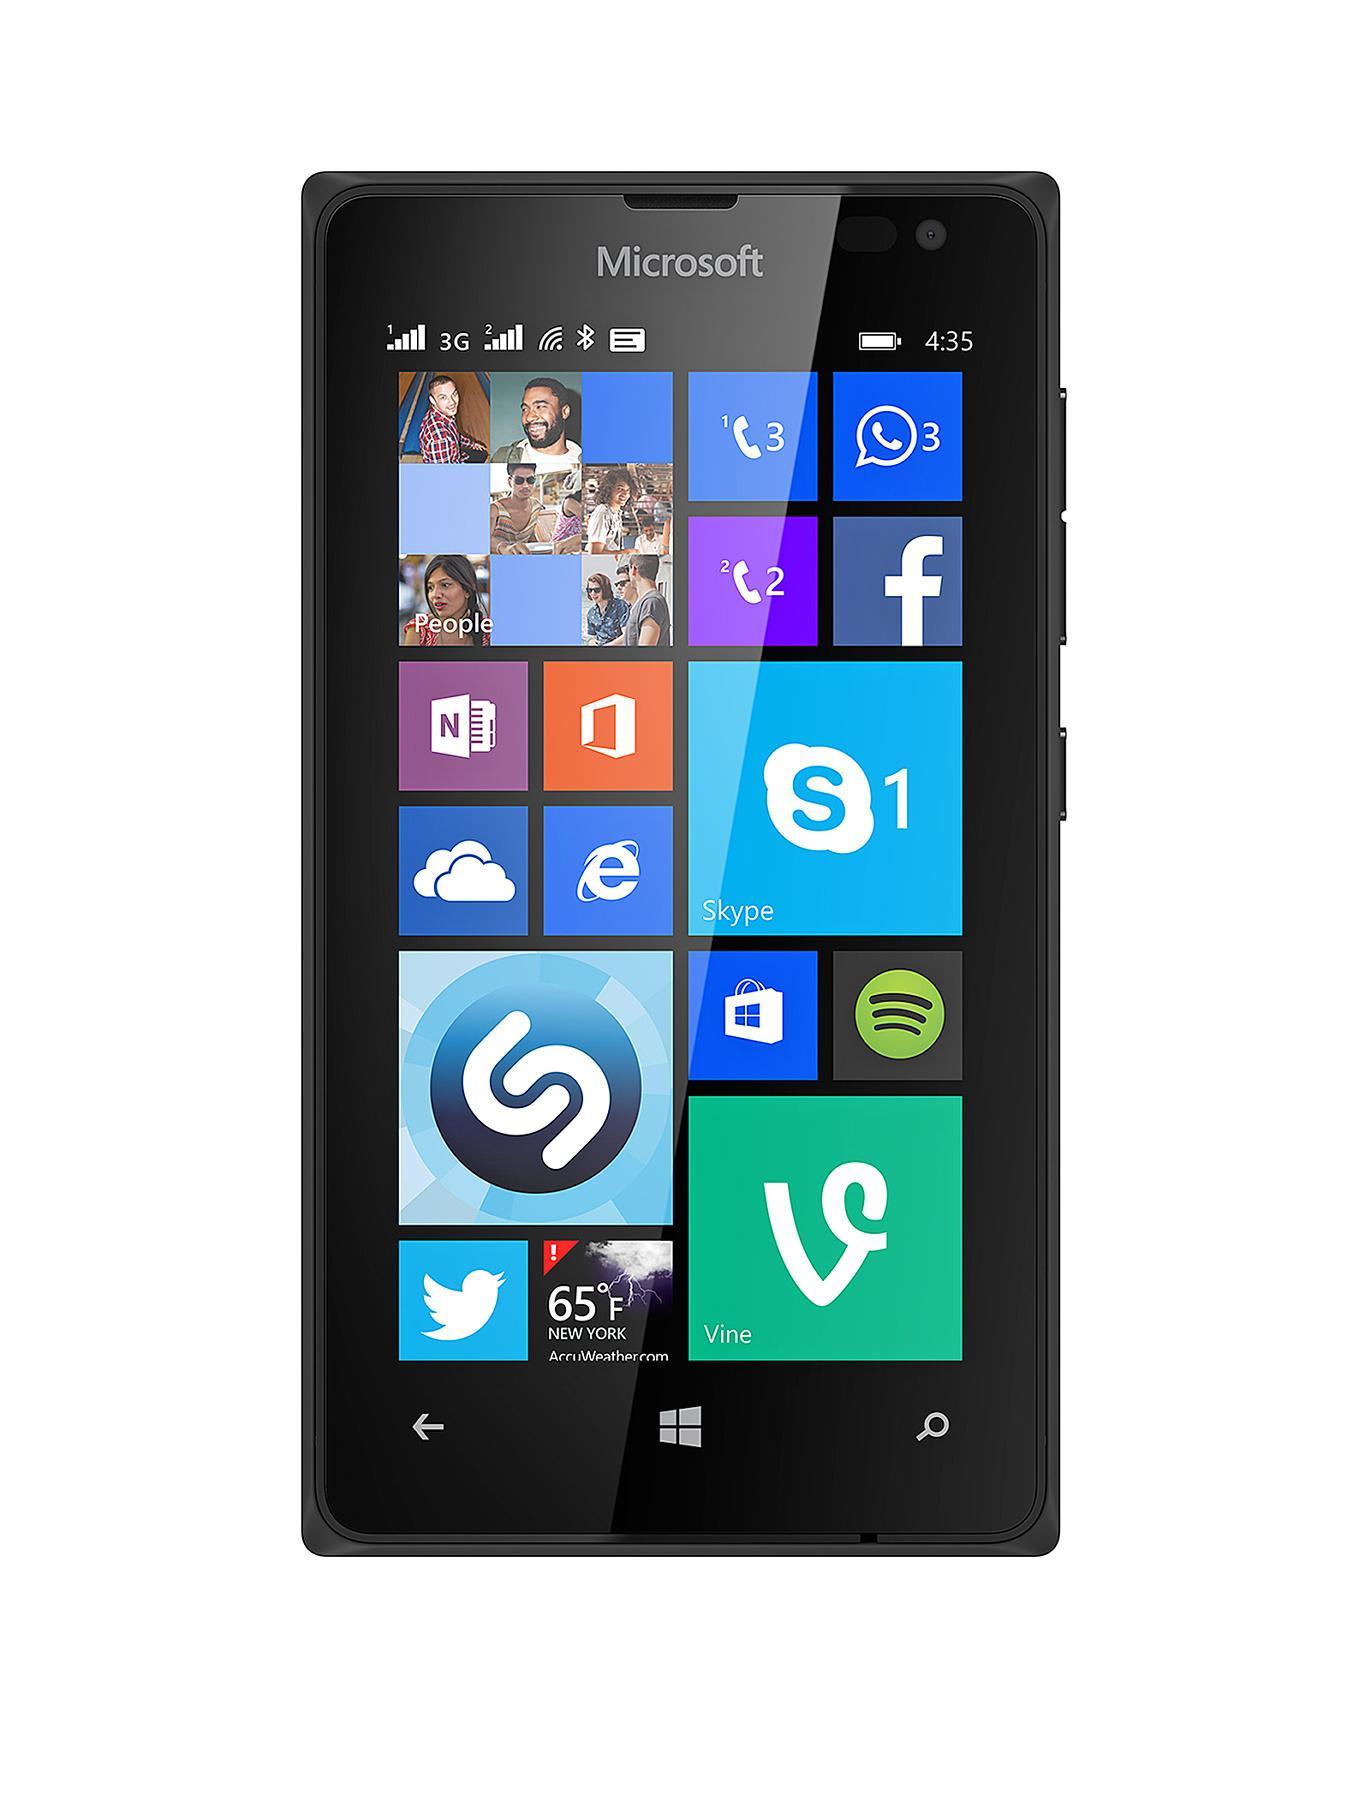 Nokia Lumia 435 Smartphone - Sim FREE Handset - Black